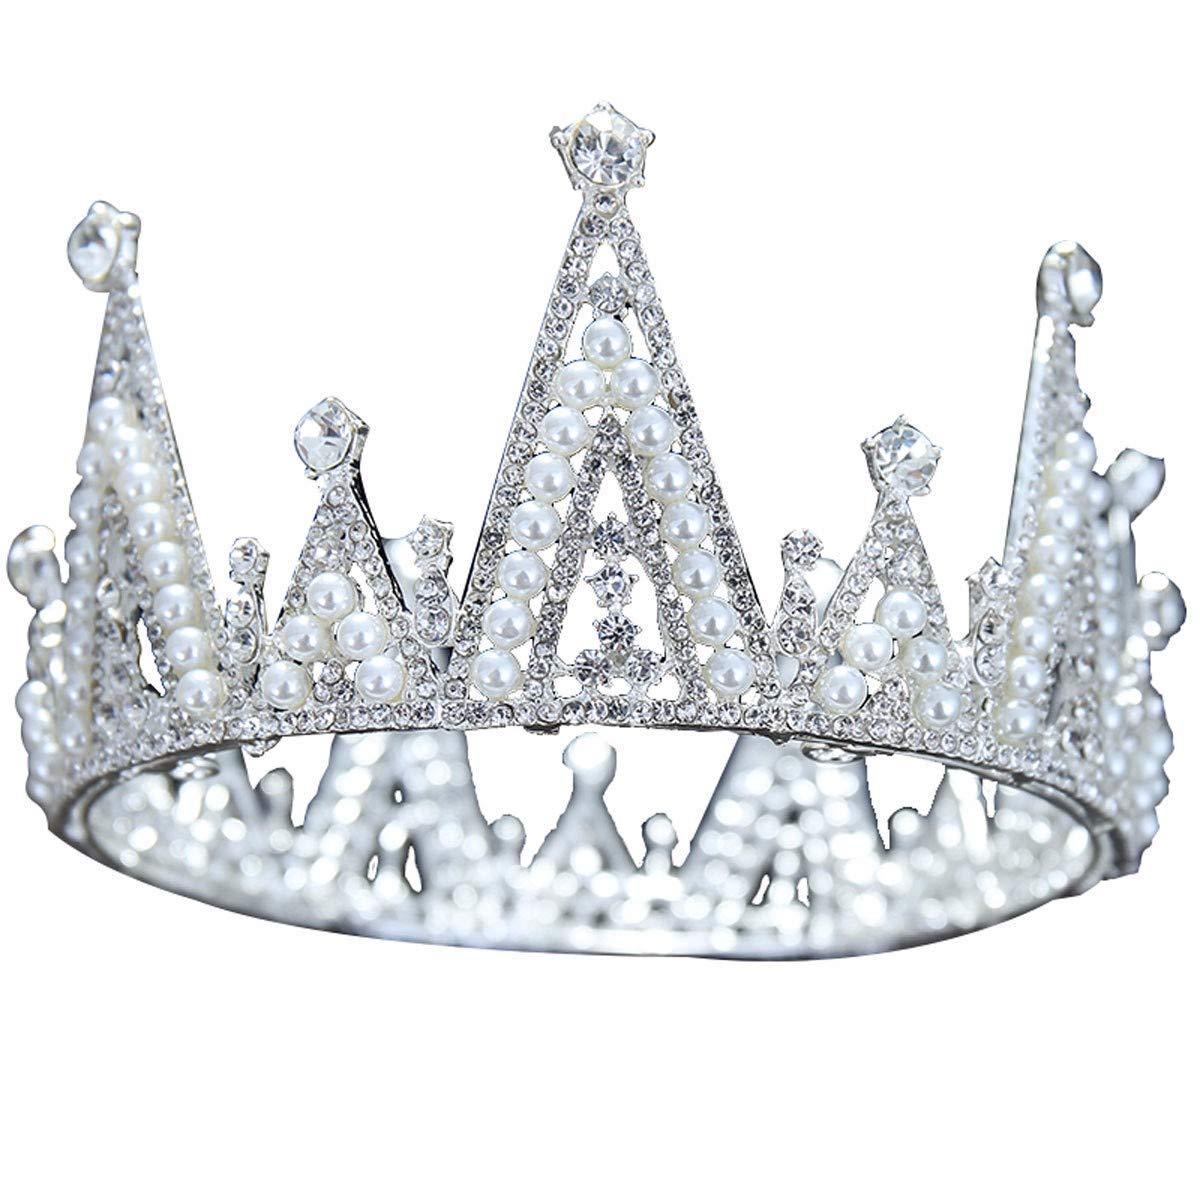 Wedding Crown, Beautiful headdress/Bridal Baroque Crystal Queen Crown Wedding Headwear Photo Studio Wedding Dress Pearl Jewelry by Junson (Image #1)